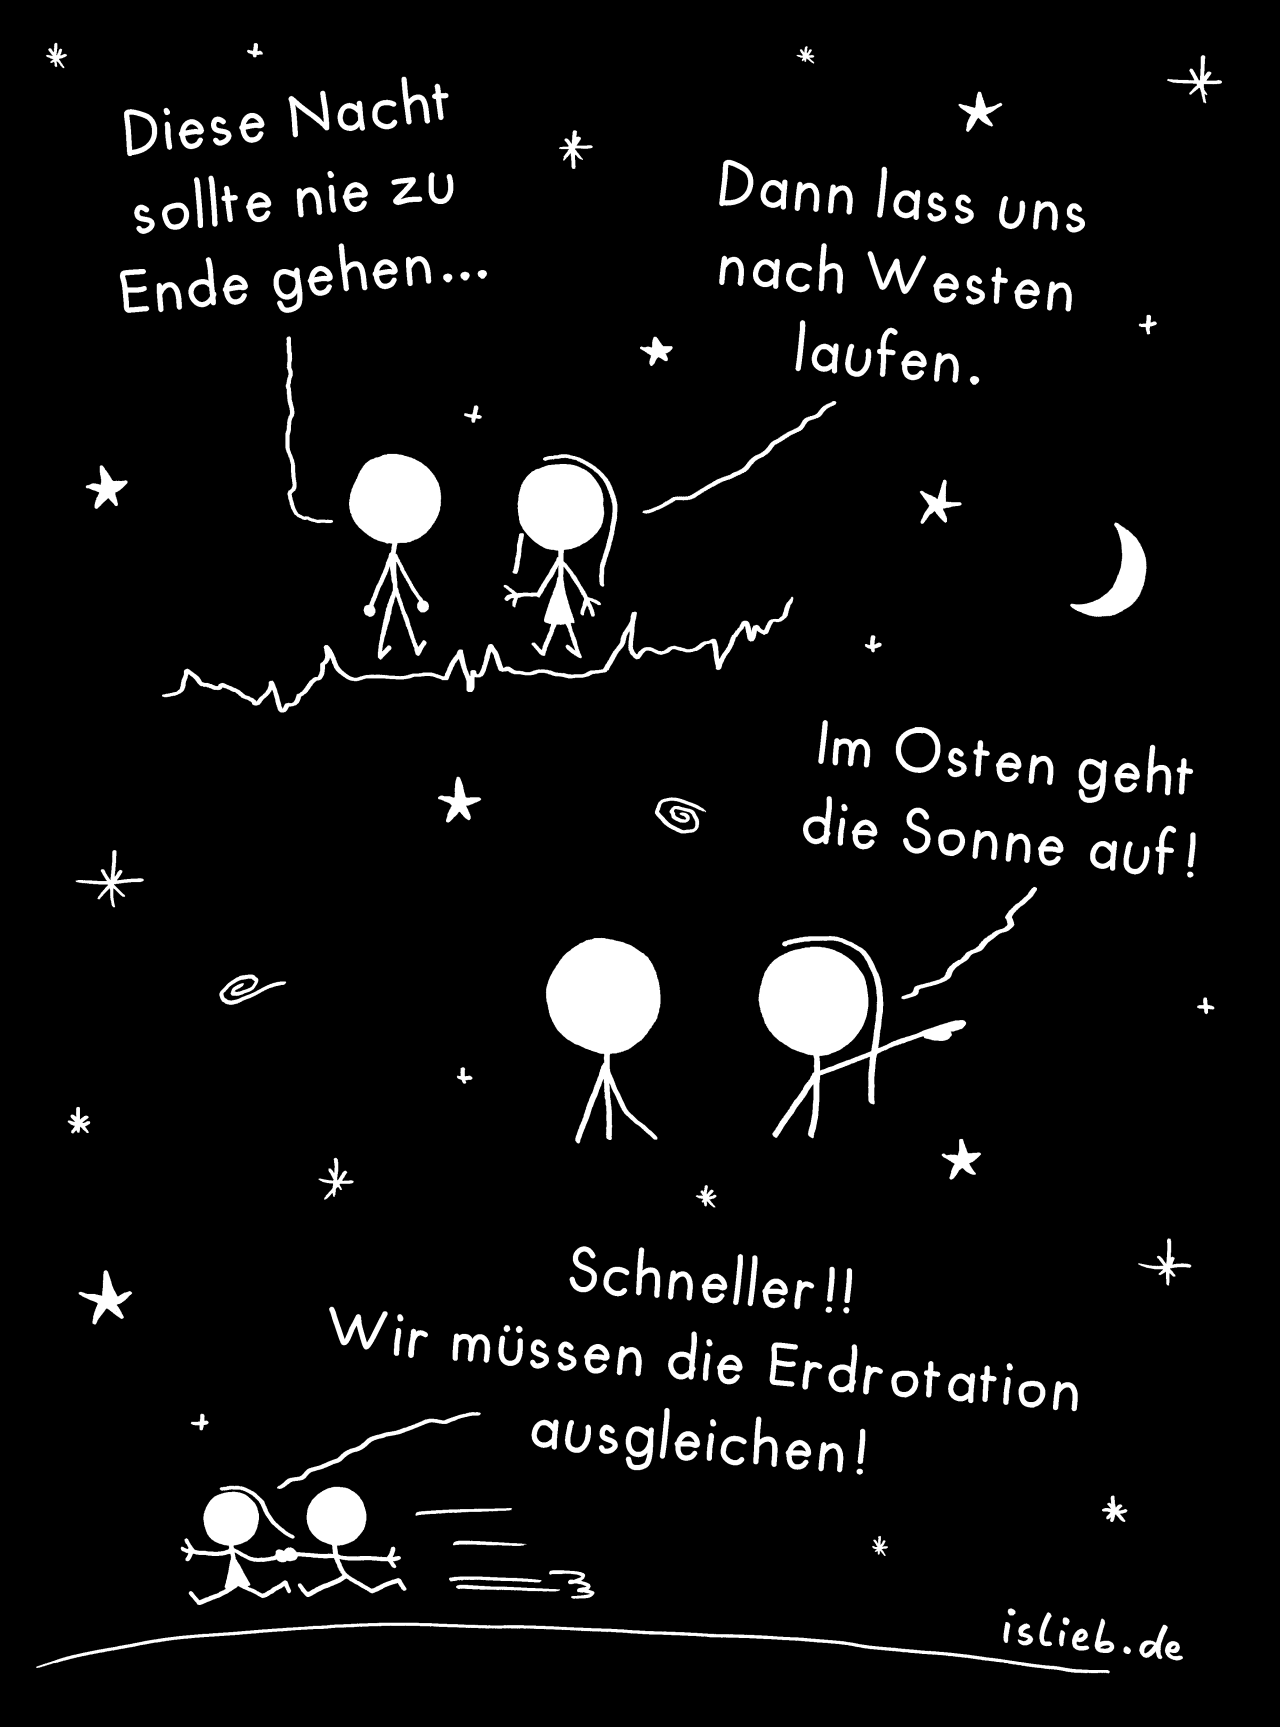 Sommernacht | >> Mehr Comics? - #comic #islieb #nacht #romantik #romantisch #sommer #sterne